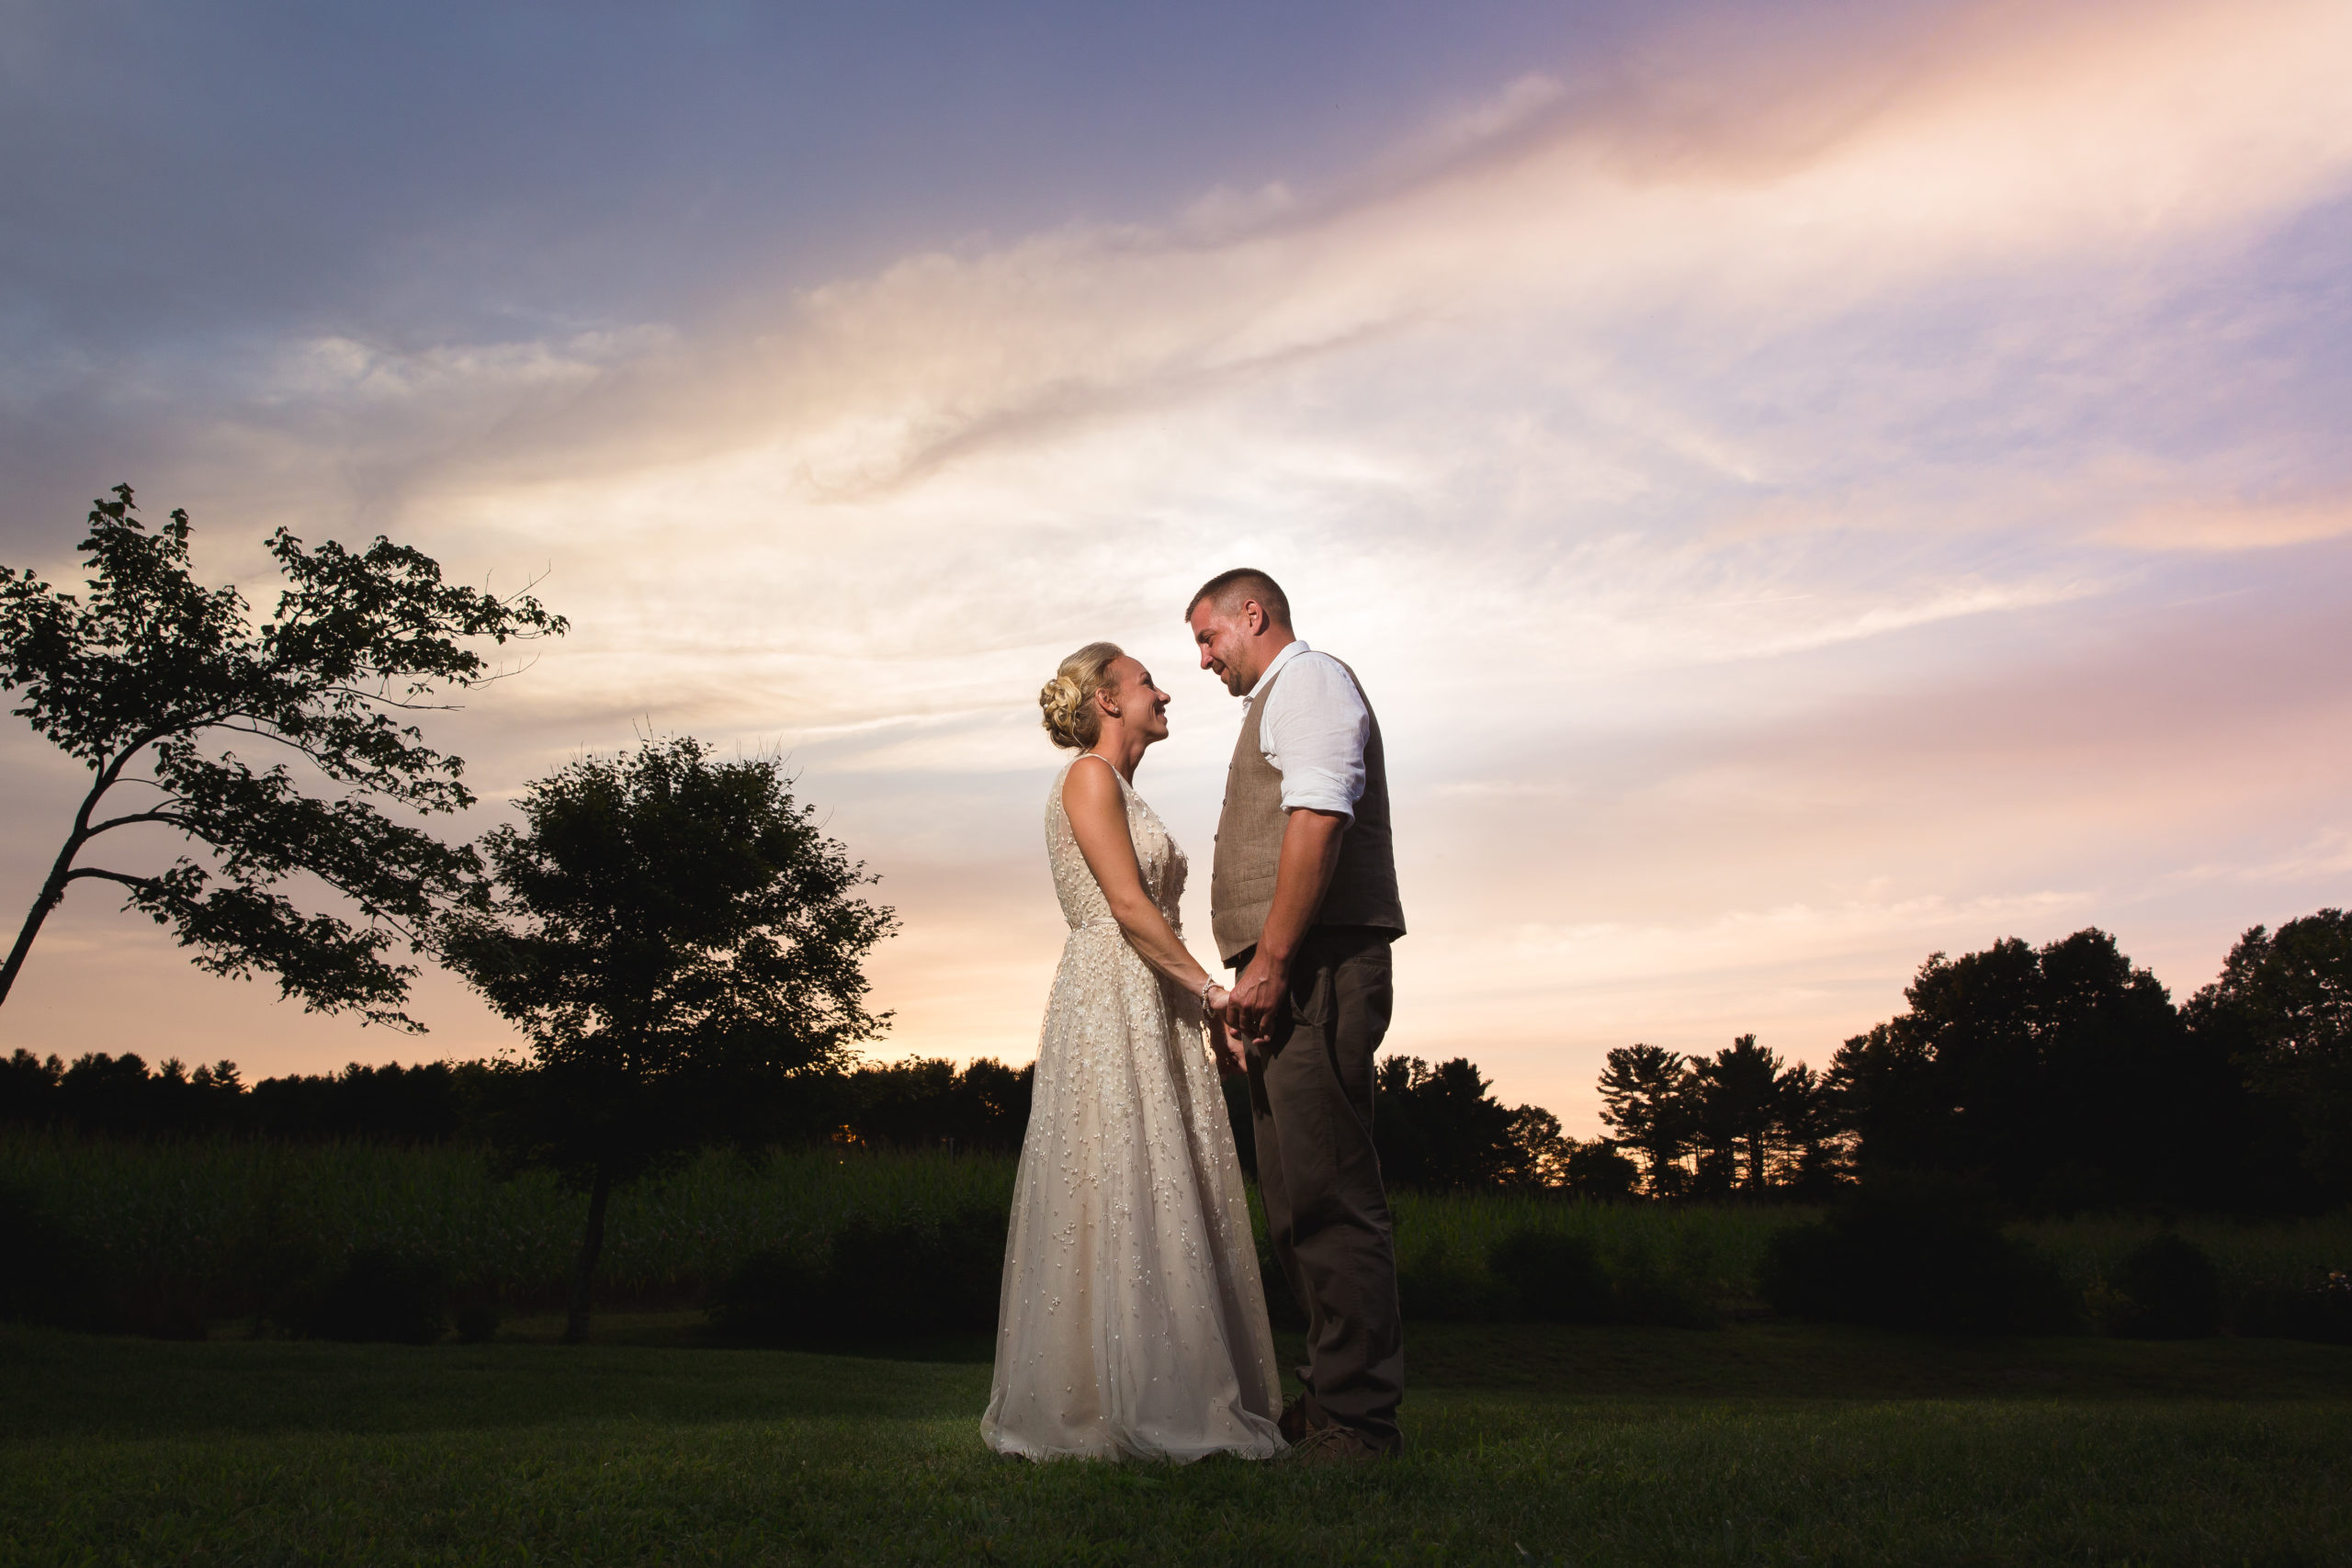 Coventry, Rhode Island, RI, Backyard Wedding, forest, earthy, wedding, tracy jenkins photography, wedding photographer, ri wedding photographer, Rhode Island Wedding photographer, couple photos, sunset